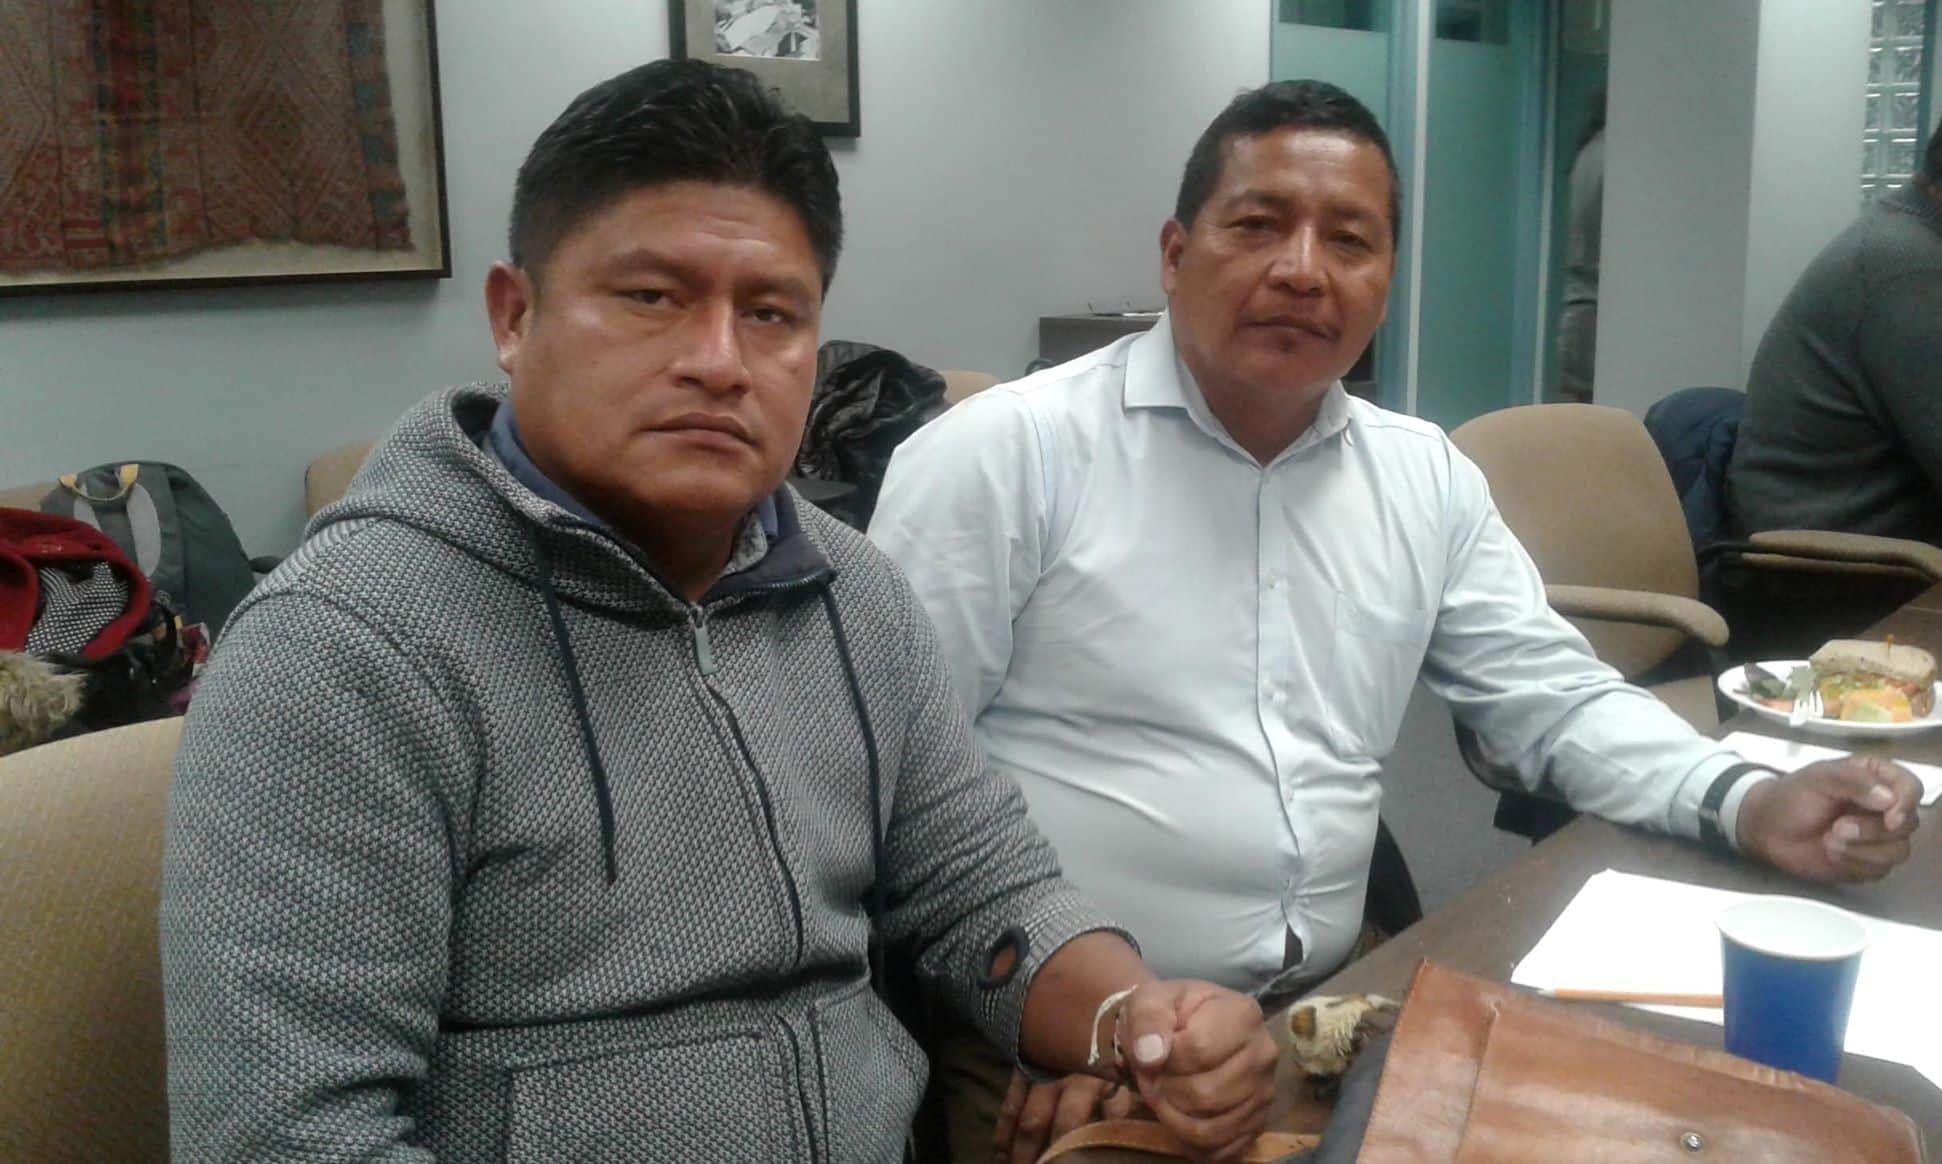 Líderes de la Unión de Personas Afectadas por Chevron-Texaco en Ecuador visitan Canadá